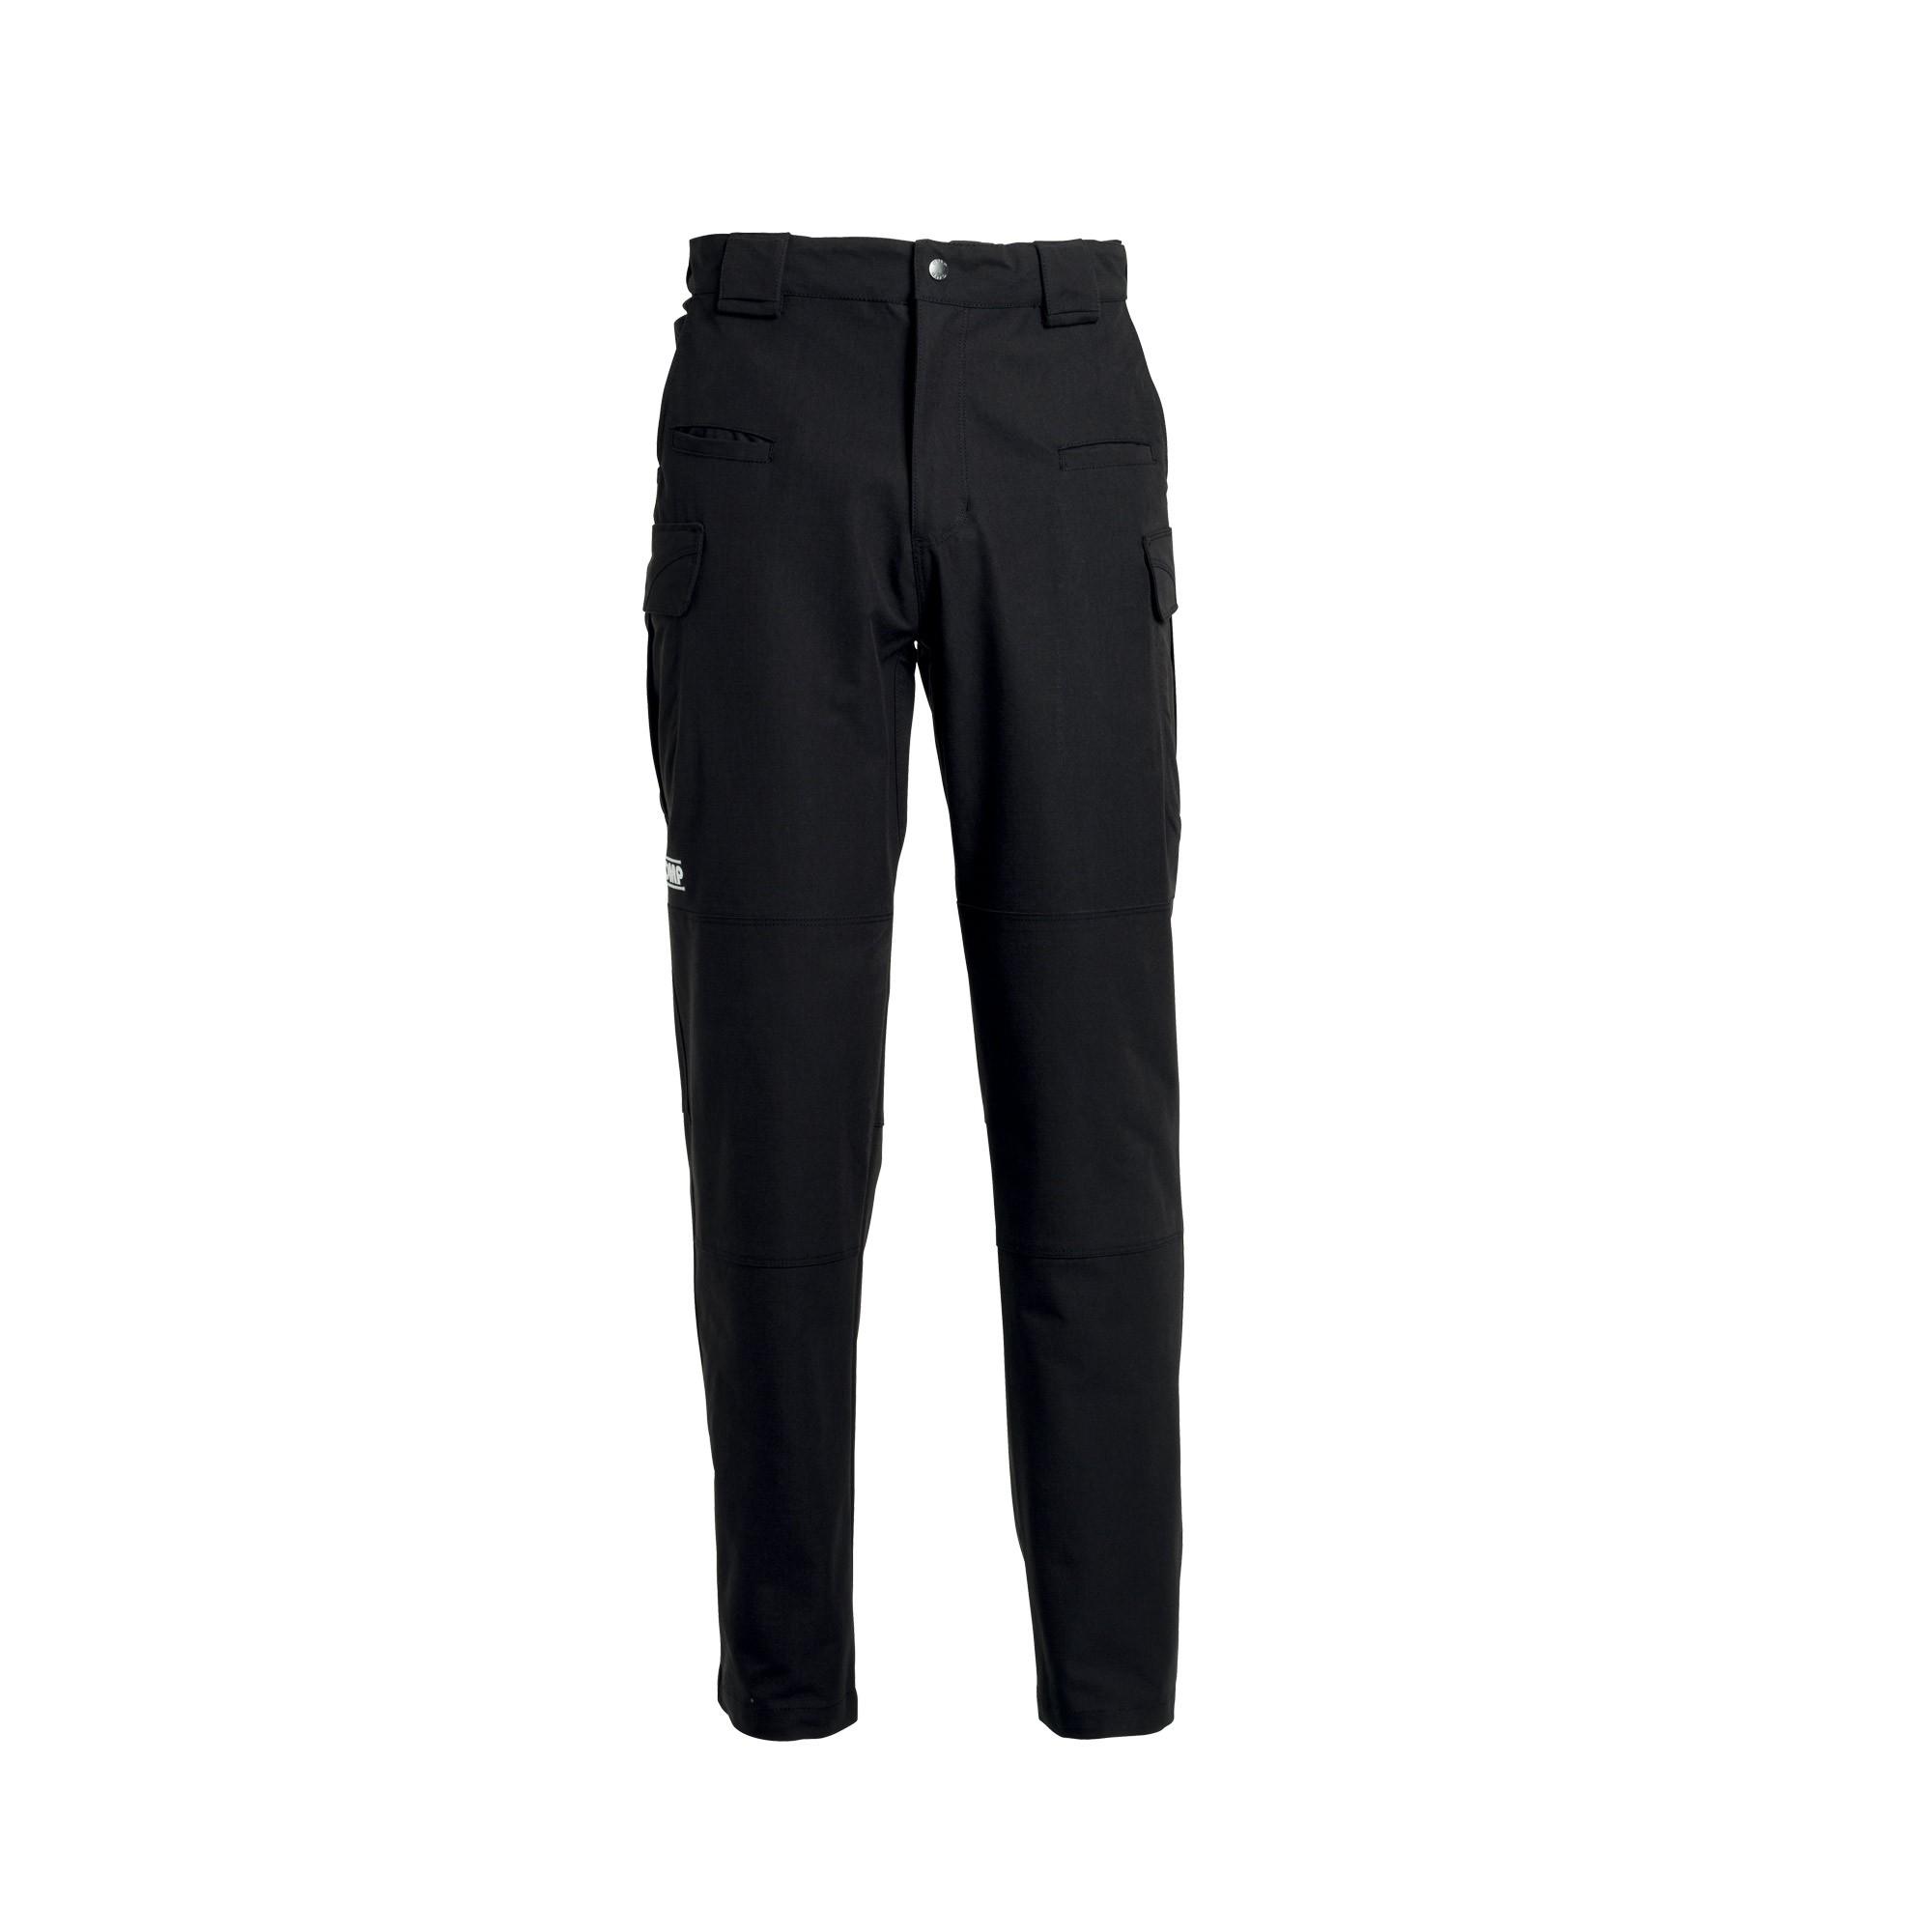 Mechanic's trousers long version